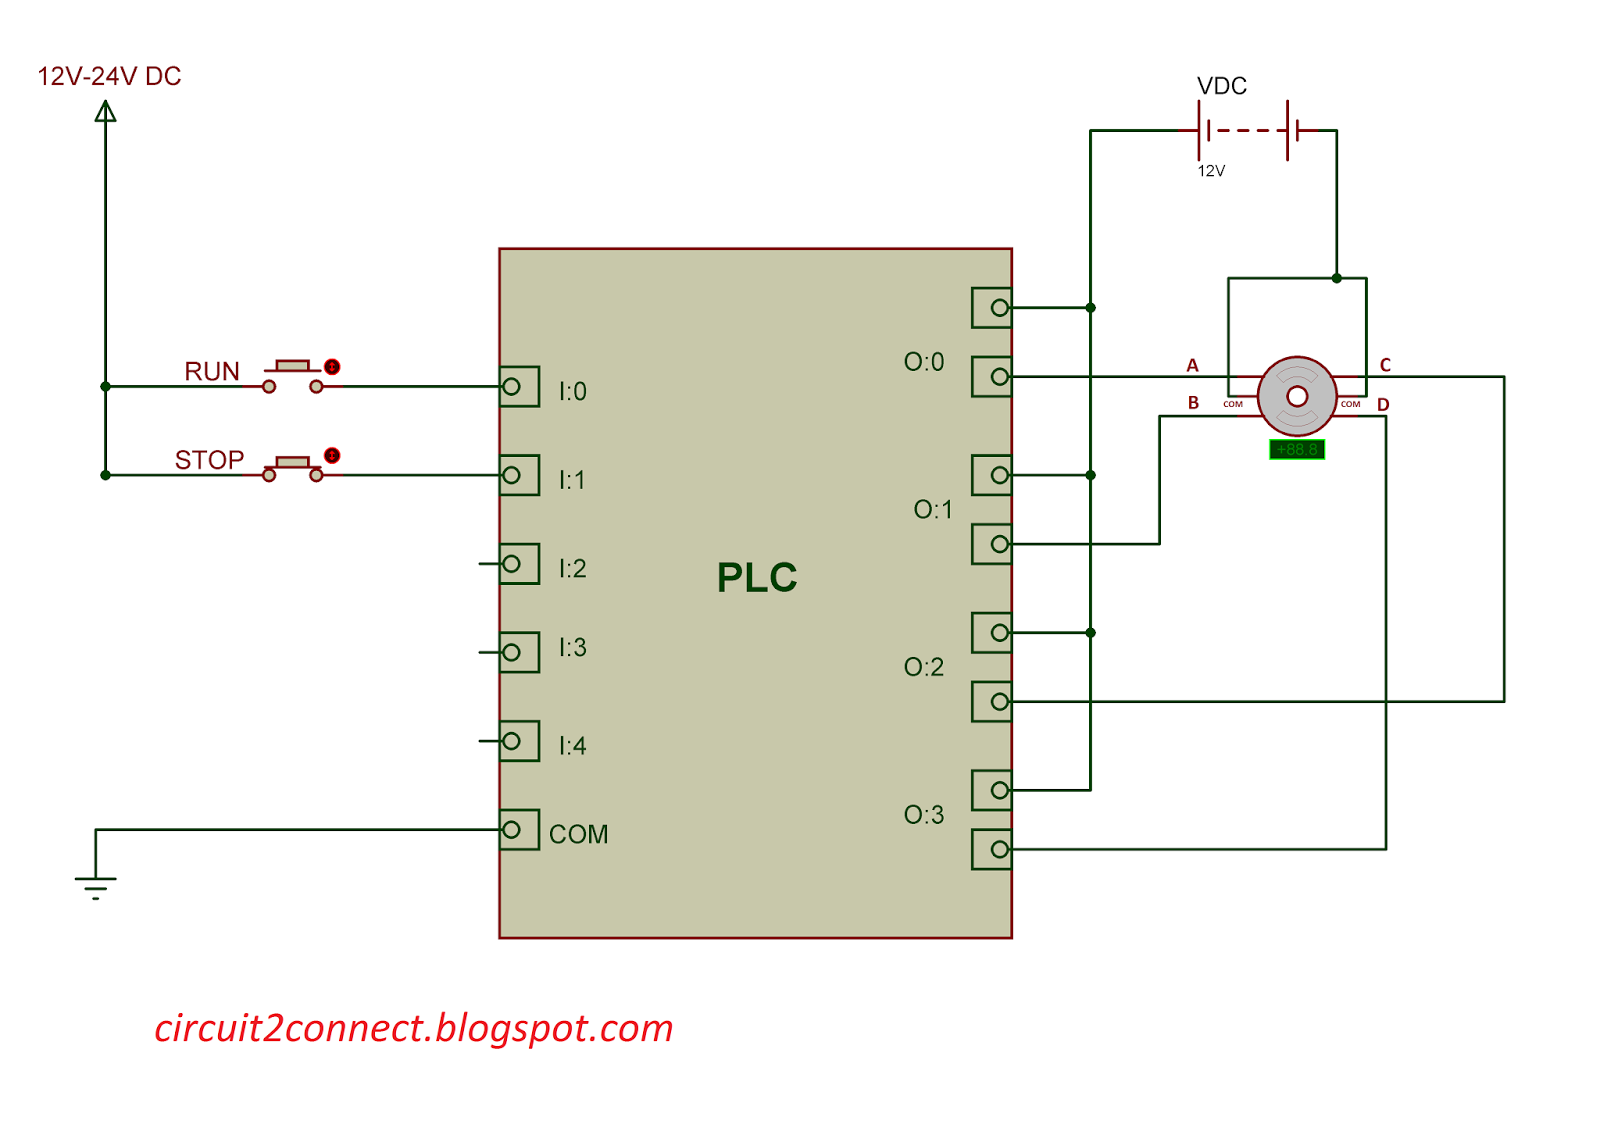 3 Way Switch Ladder Diagram Ge Kilowatt Hour Meter Wiring Wire Motor Control Diagrams Library